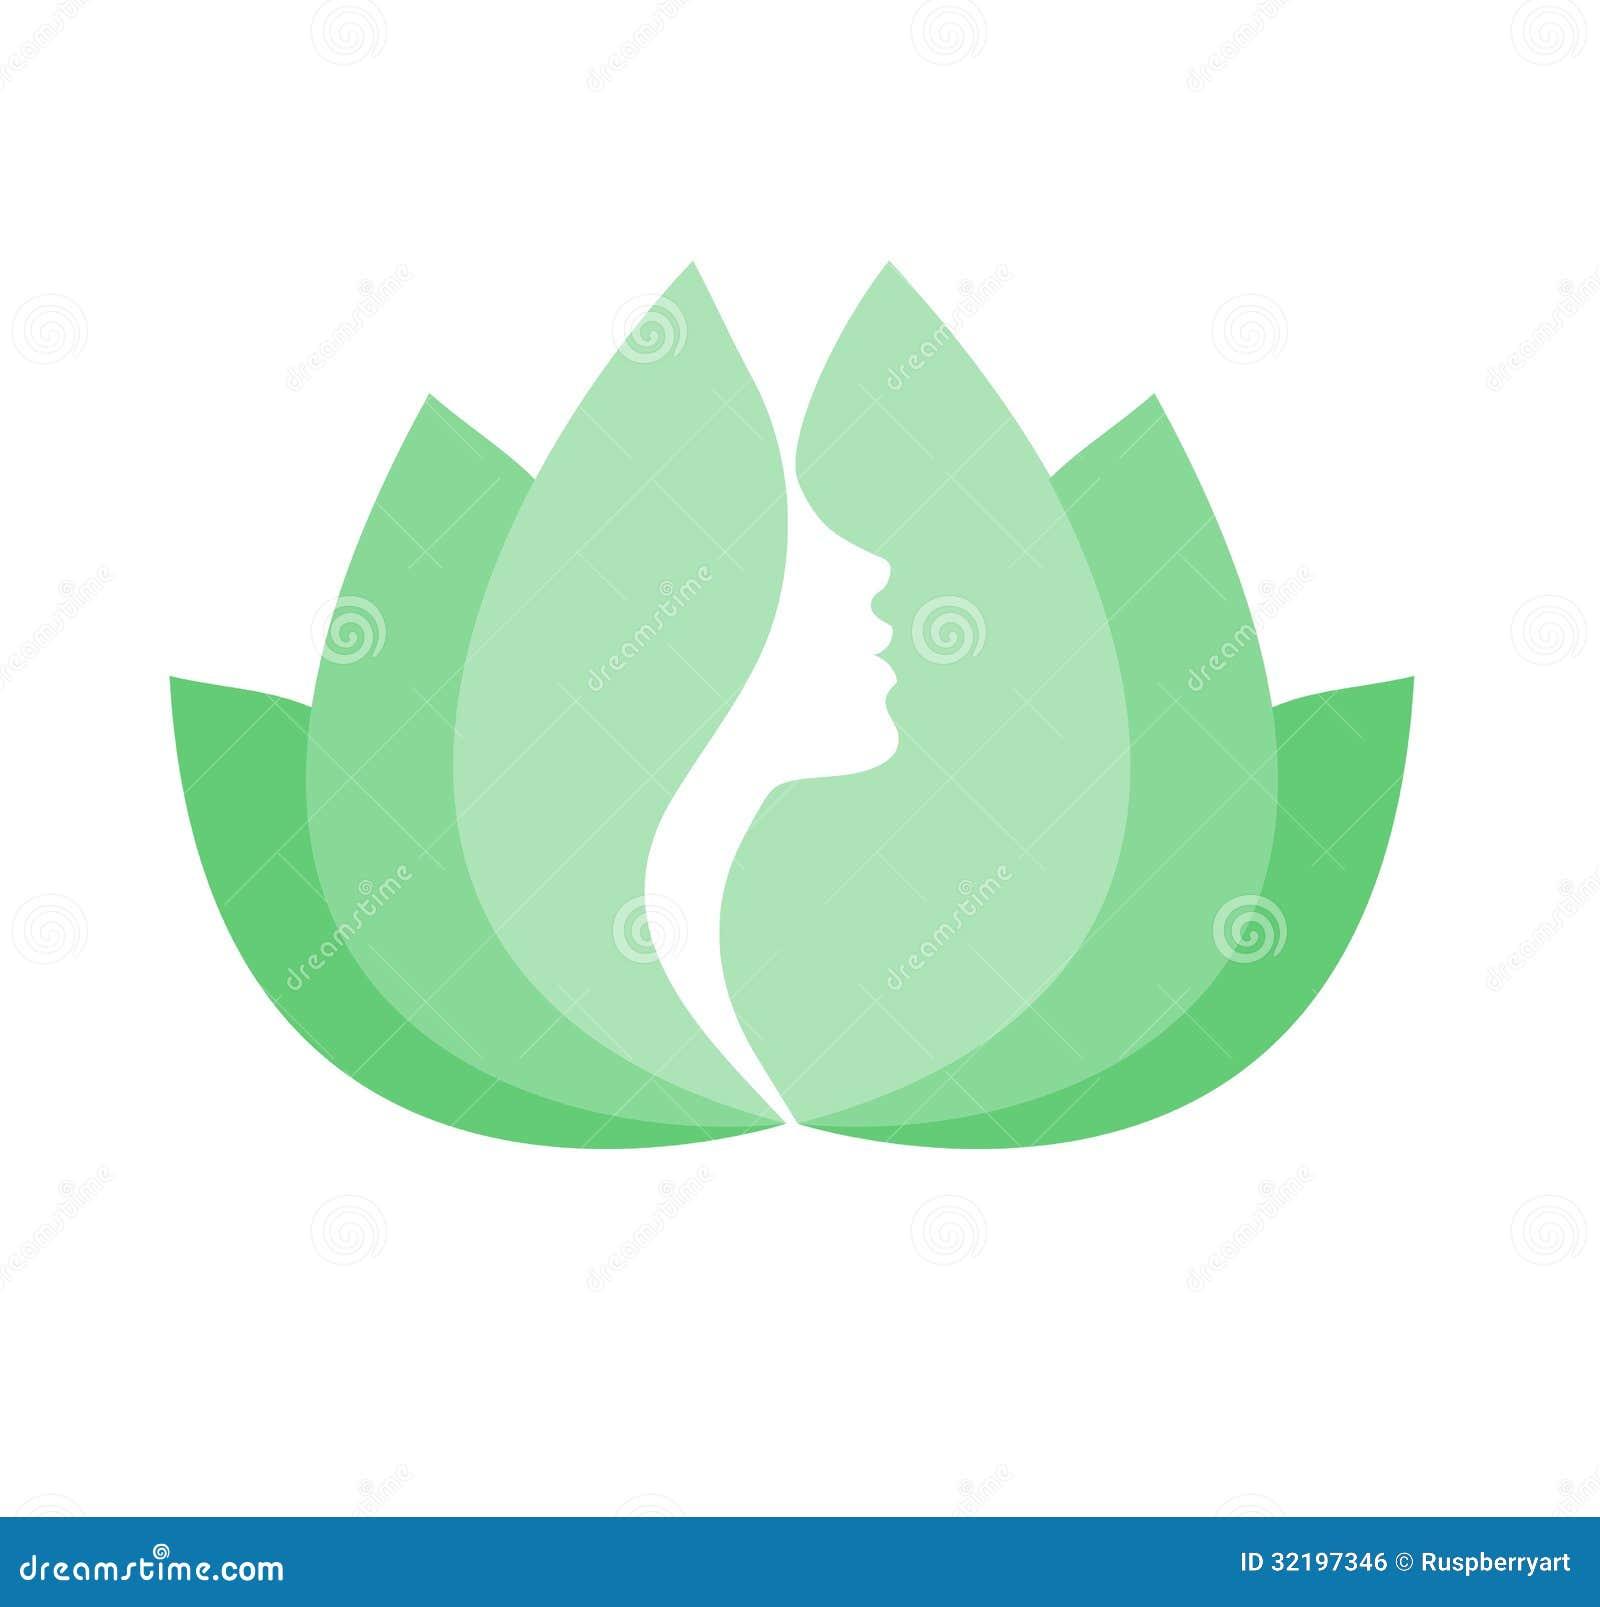 Female face in green lotus flower stock vector illustration of female face in green lotus flower izmirmasajfo